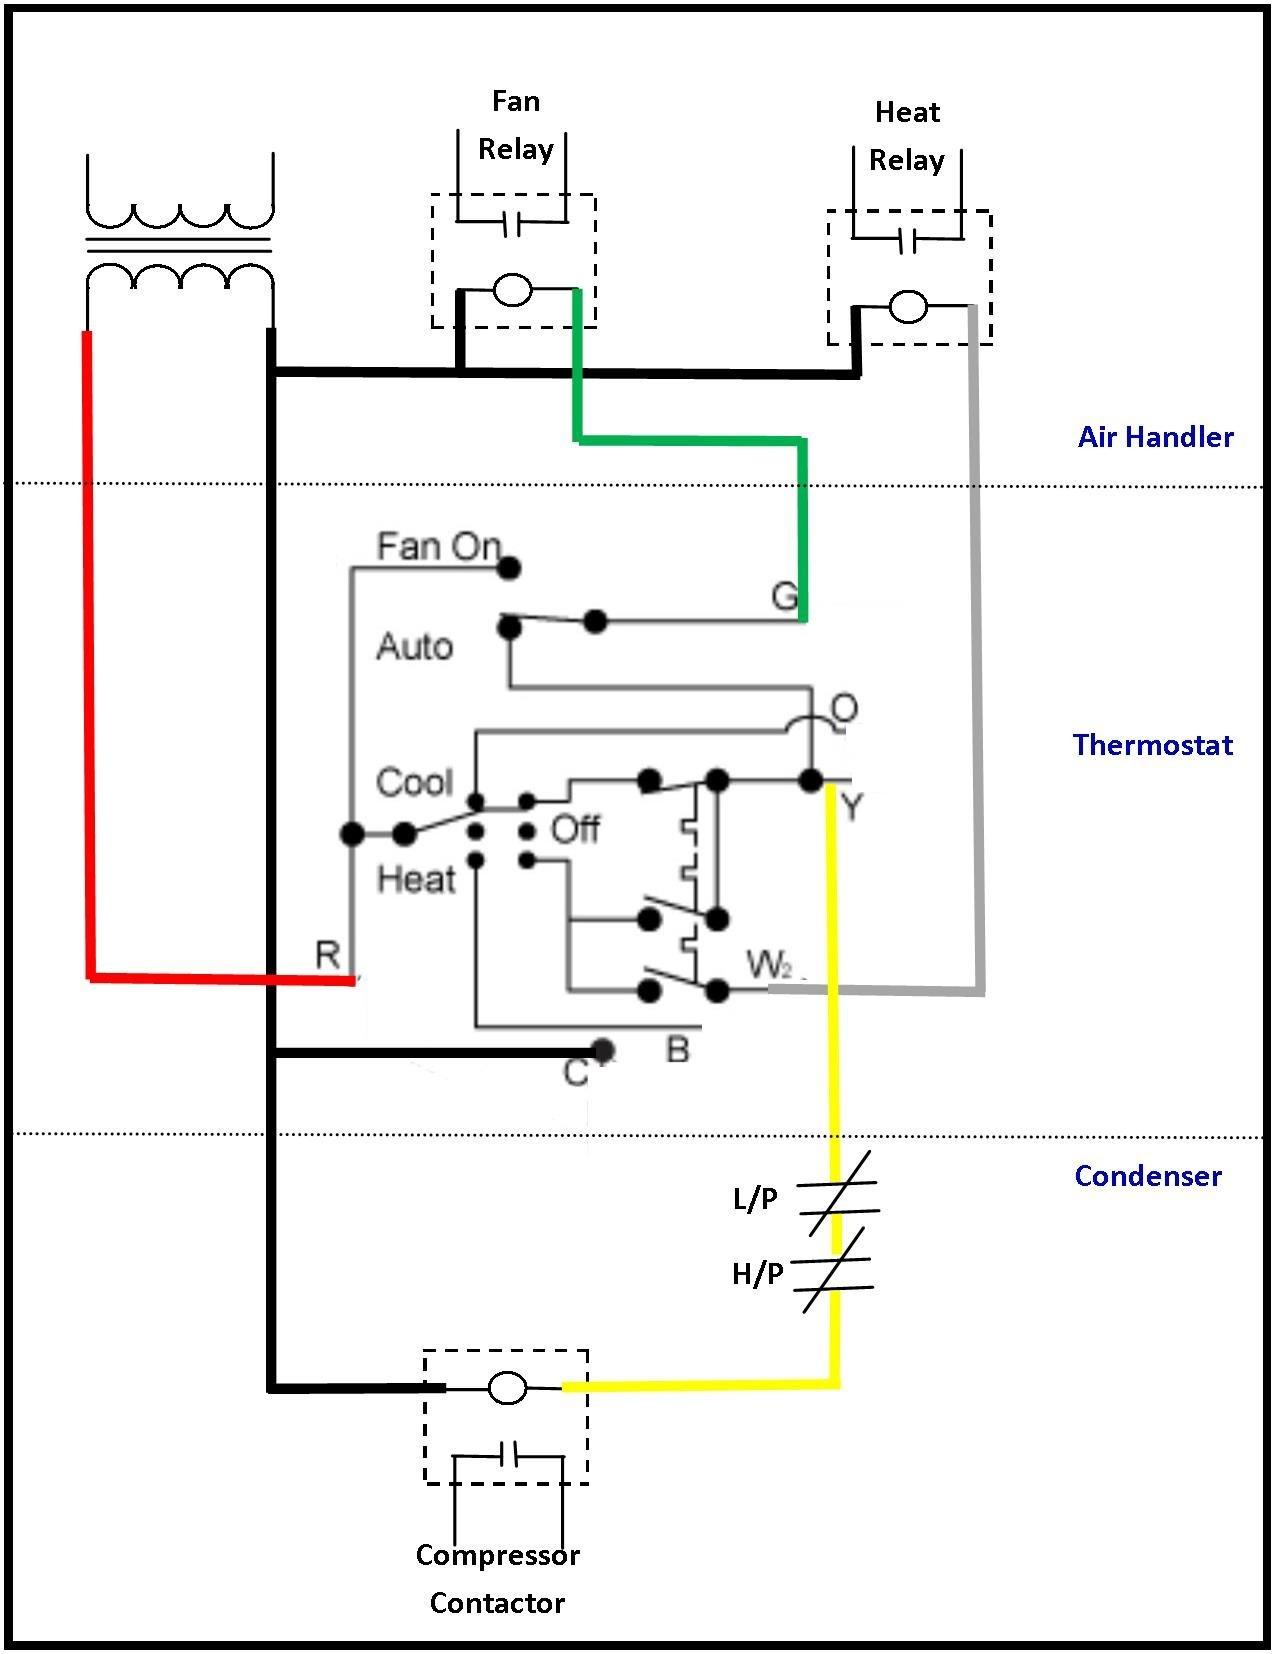 goodman fan relay wiring diagram electric sub meter air handler free